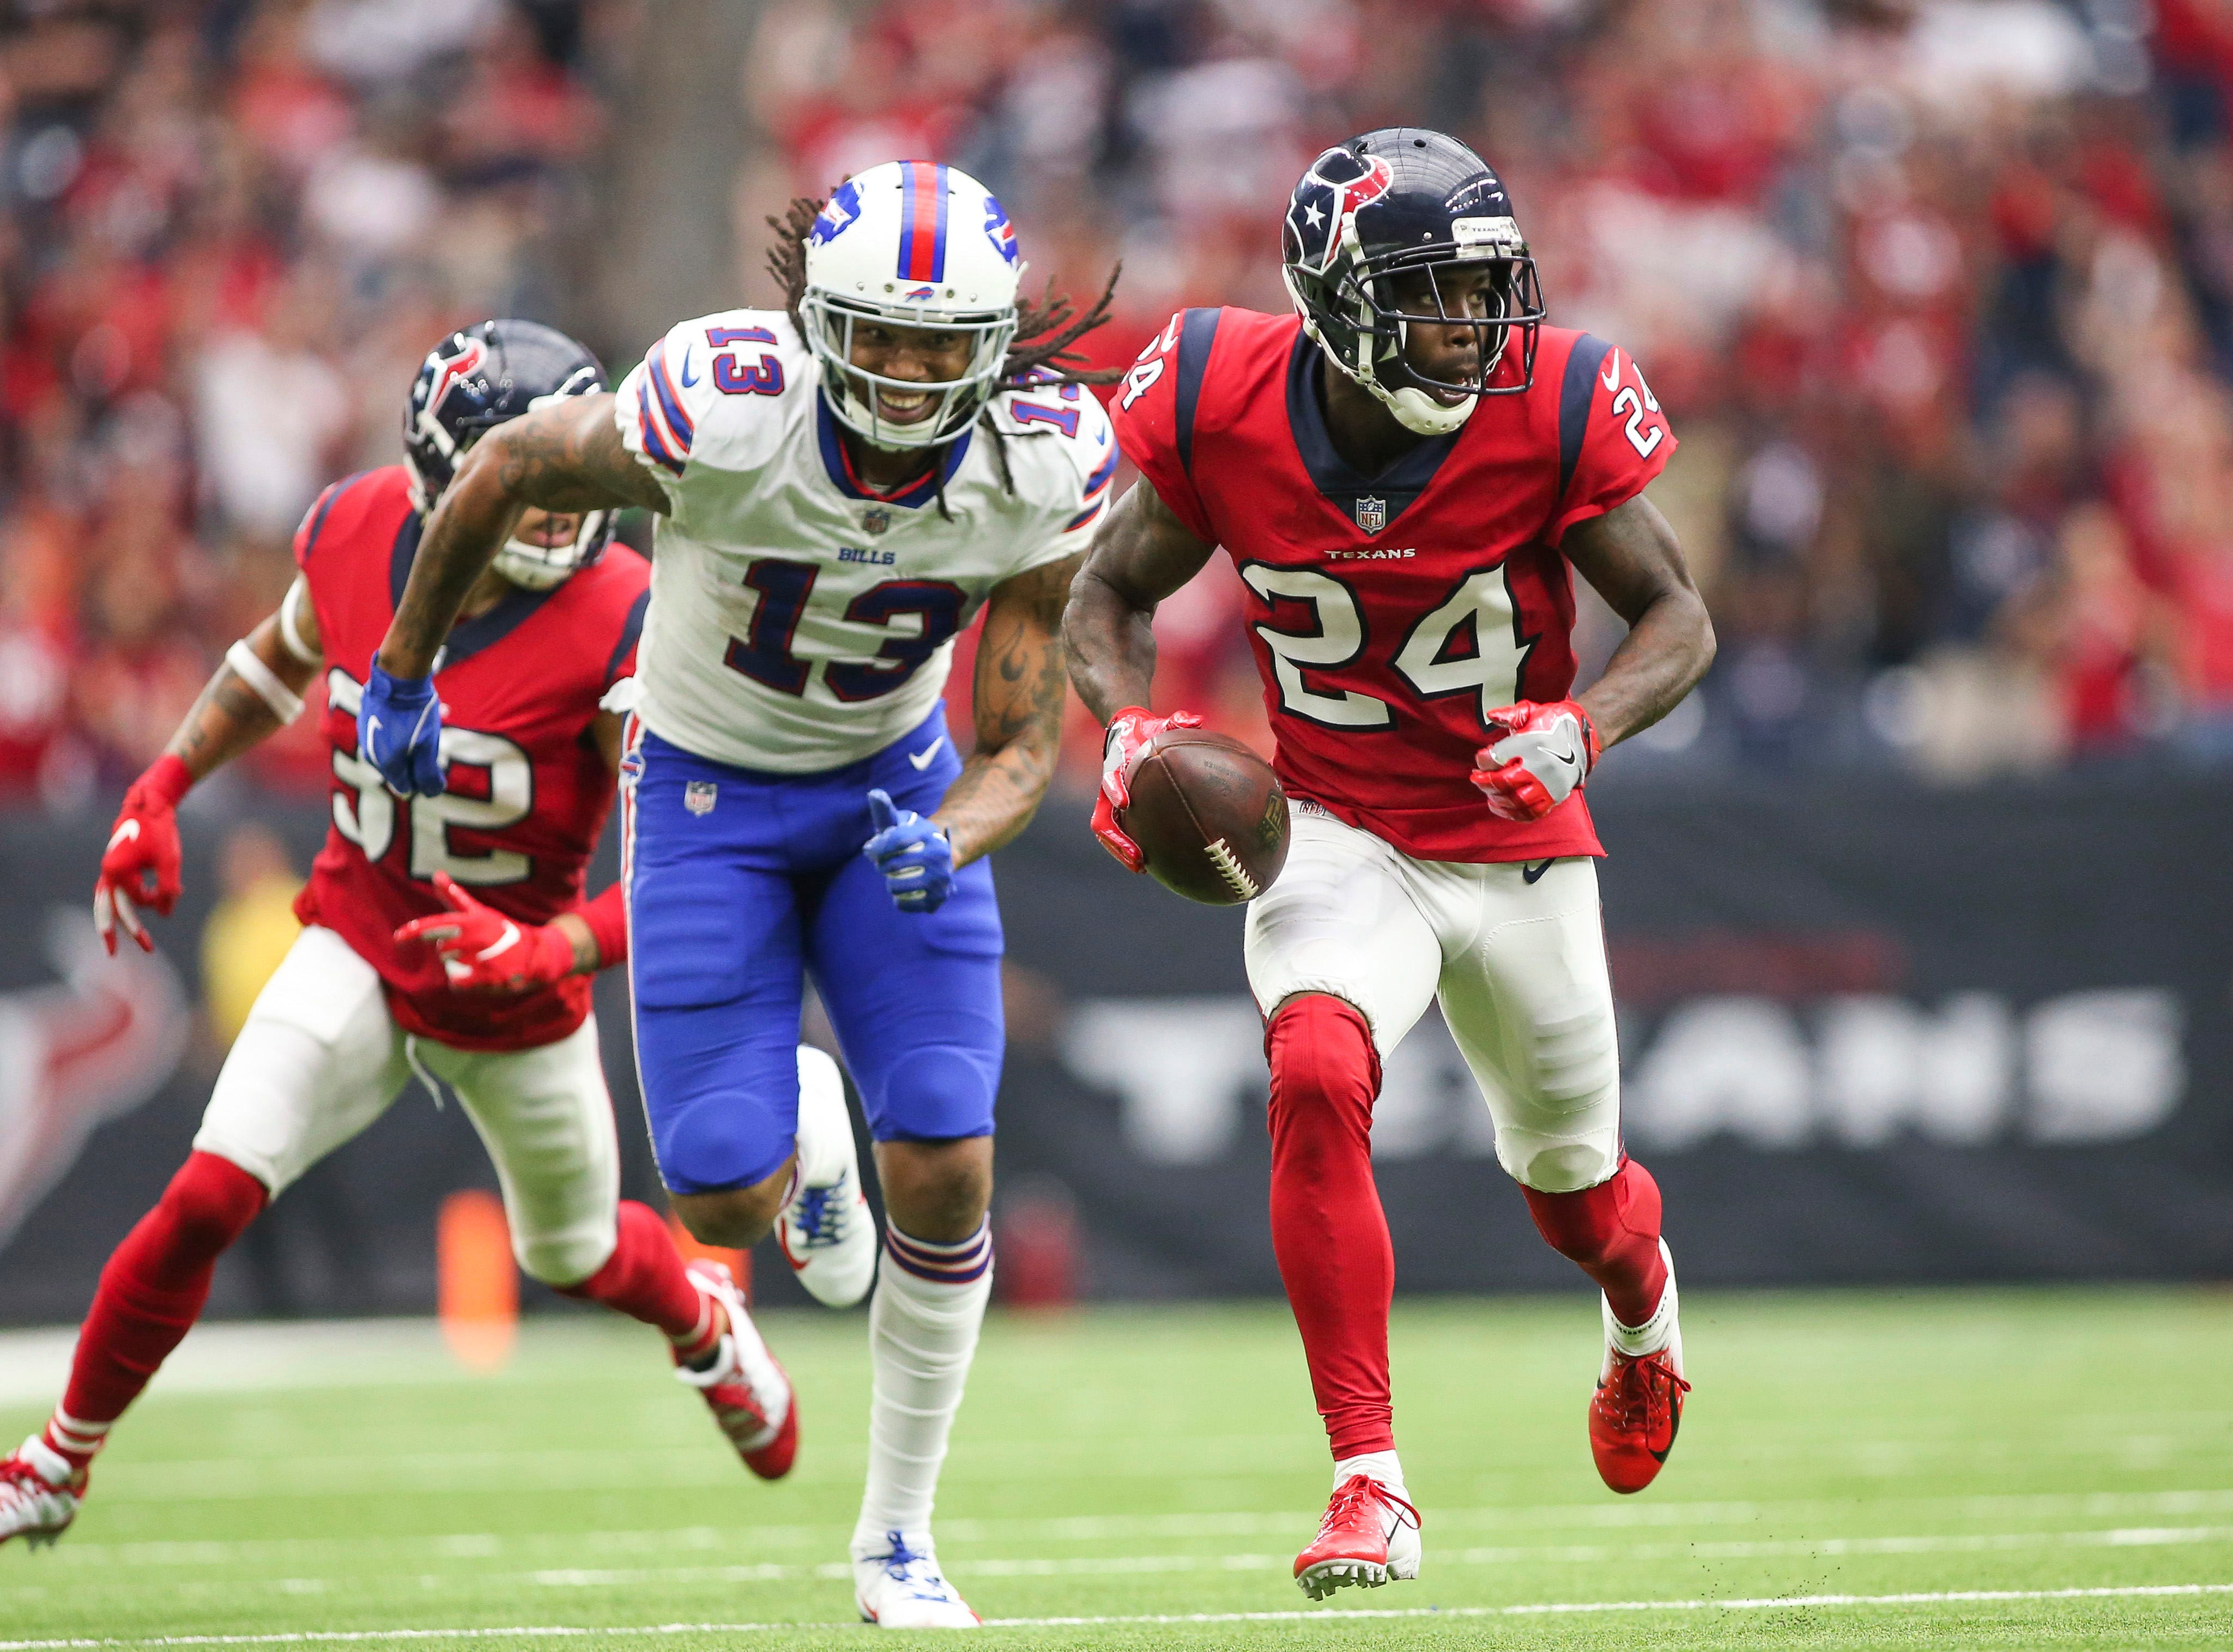 Oct 14, 2018; Houston, TX, USA; Houston Texans cornerback Johnathan Joseph (24) returns an interception for a touchdown during the fourth quarter against Buffalo Bills wide receiver Kelvin Benjamin (13) at NRG Stadium. Mandatory Credit: Troy Taormina-USA TODAY Sports